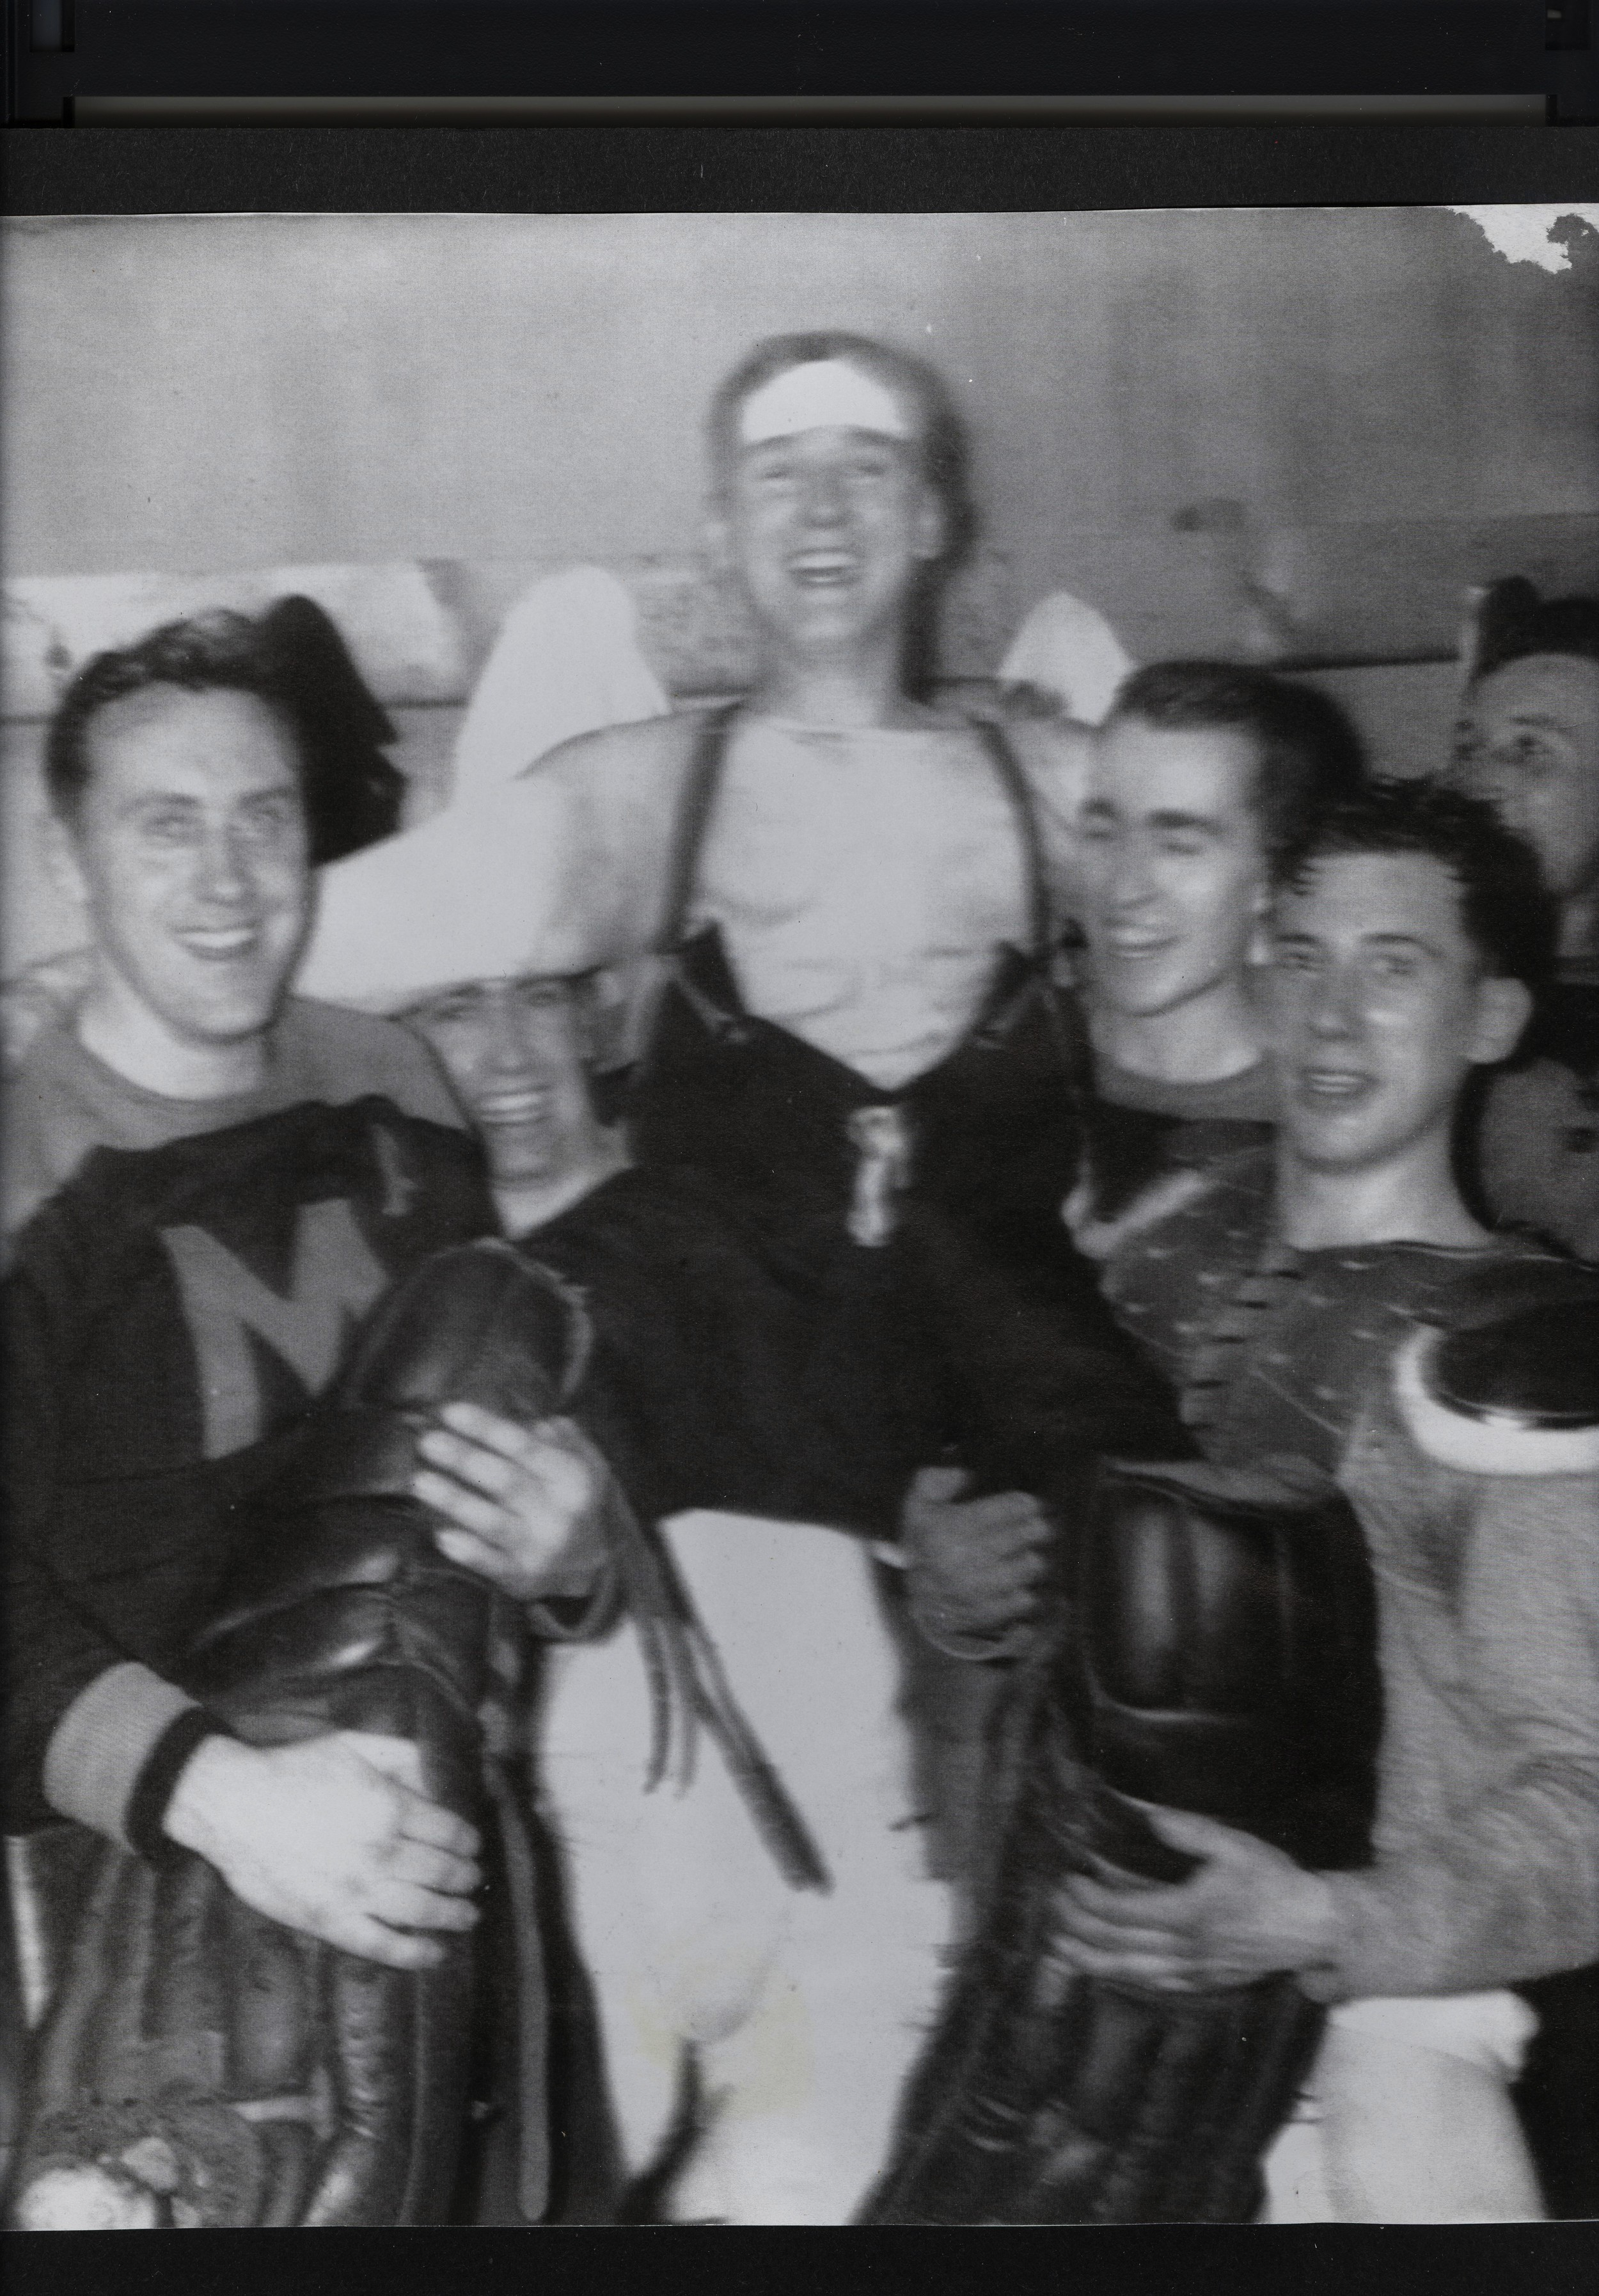 Fred Stewart, Ray Darrah. El Killian, unknown, Ken (Stub) Trumble, Bernard Doyle